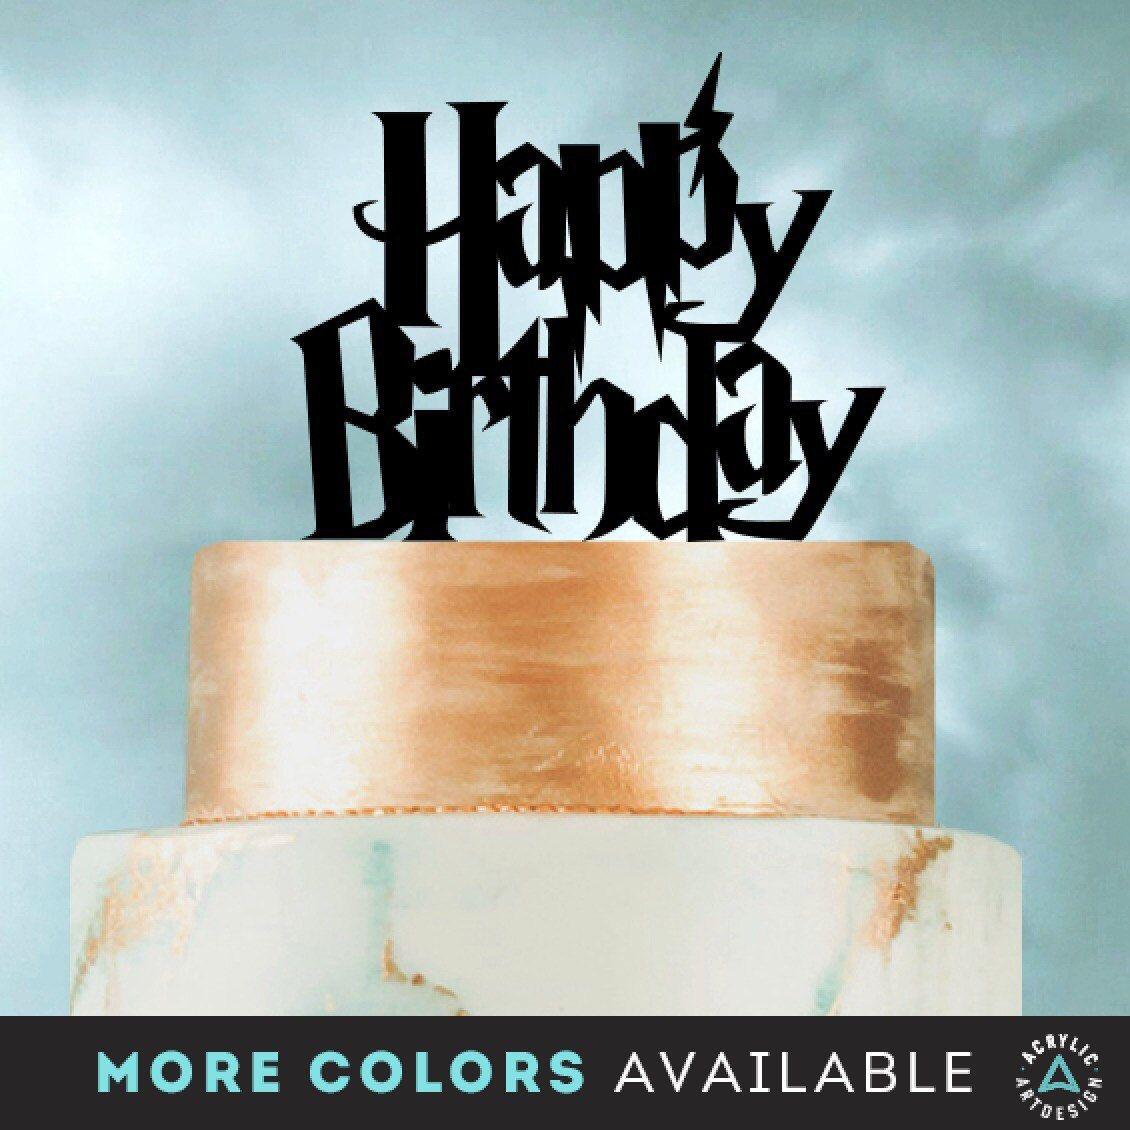 Happy Birthday Harry Potter Cake Topper By Acrylic Art Design